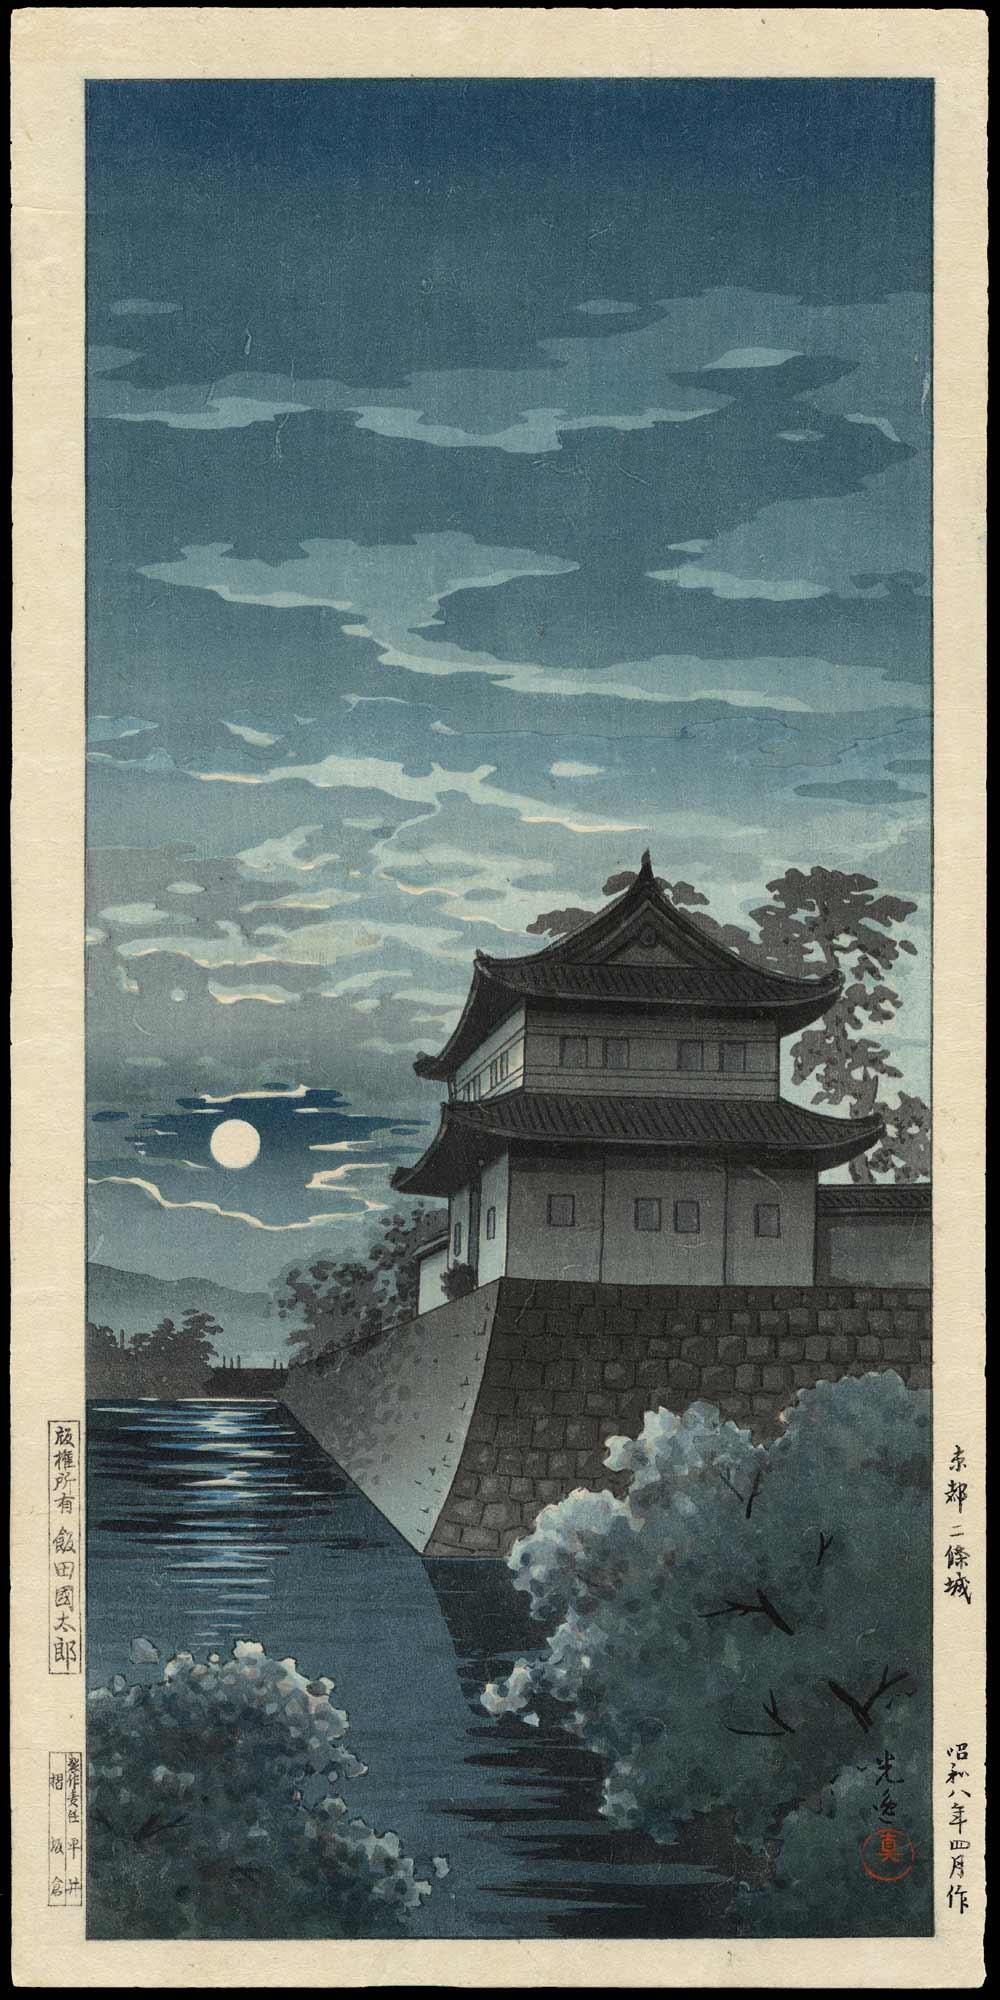 1000 Images About Bi Level Homes On Pinterest: 1000+ Images About Japanese Art: Tsuchiya Koitsu On